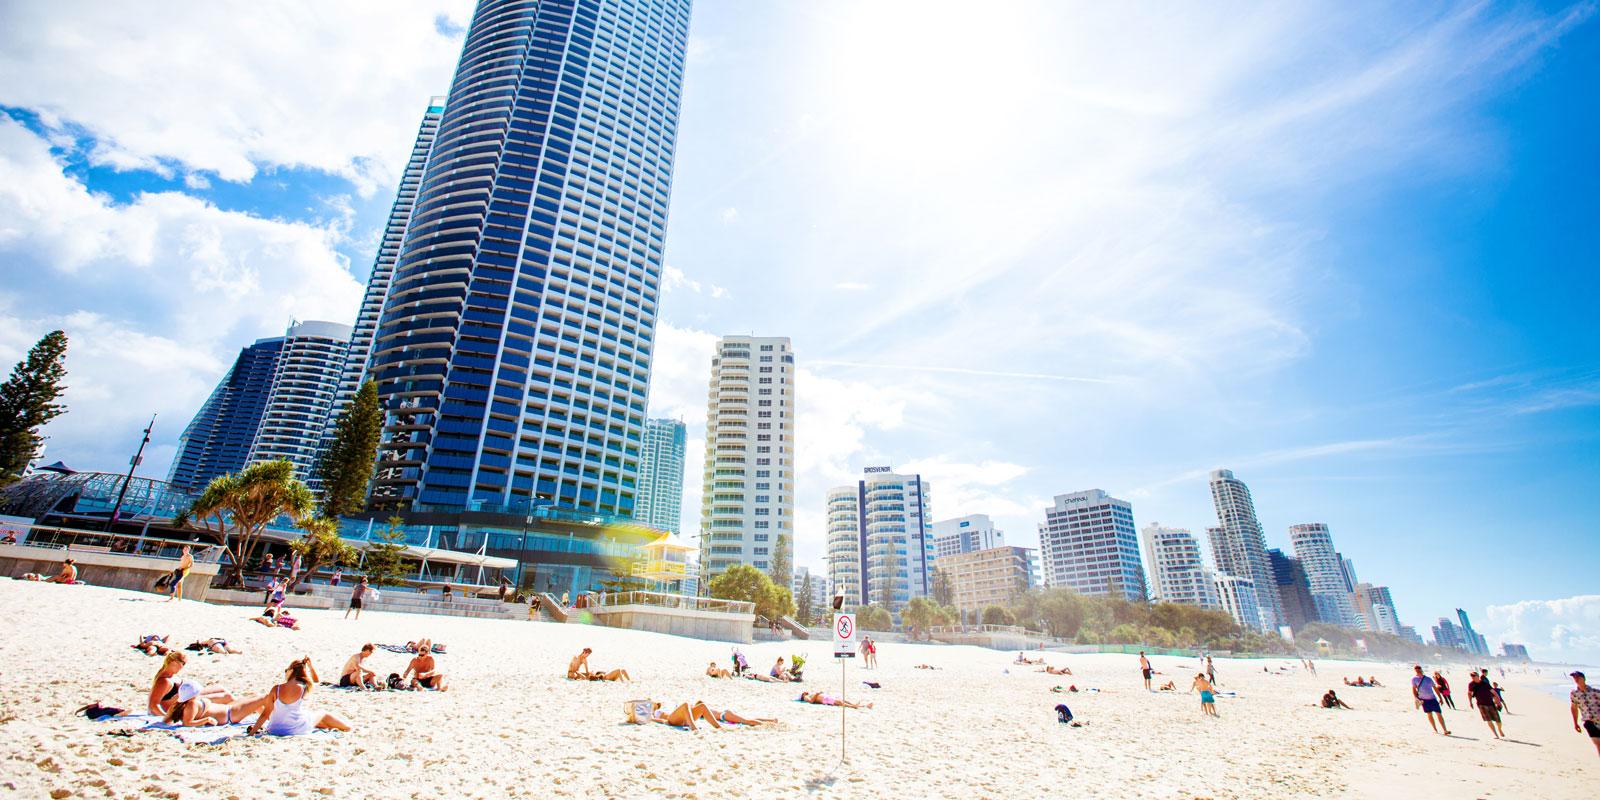 昆士兰景点-黄金海岸